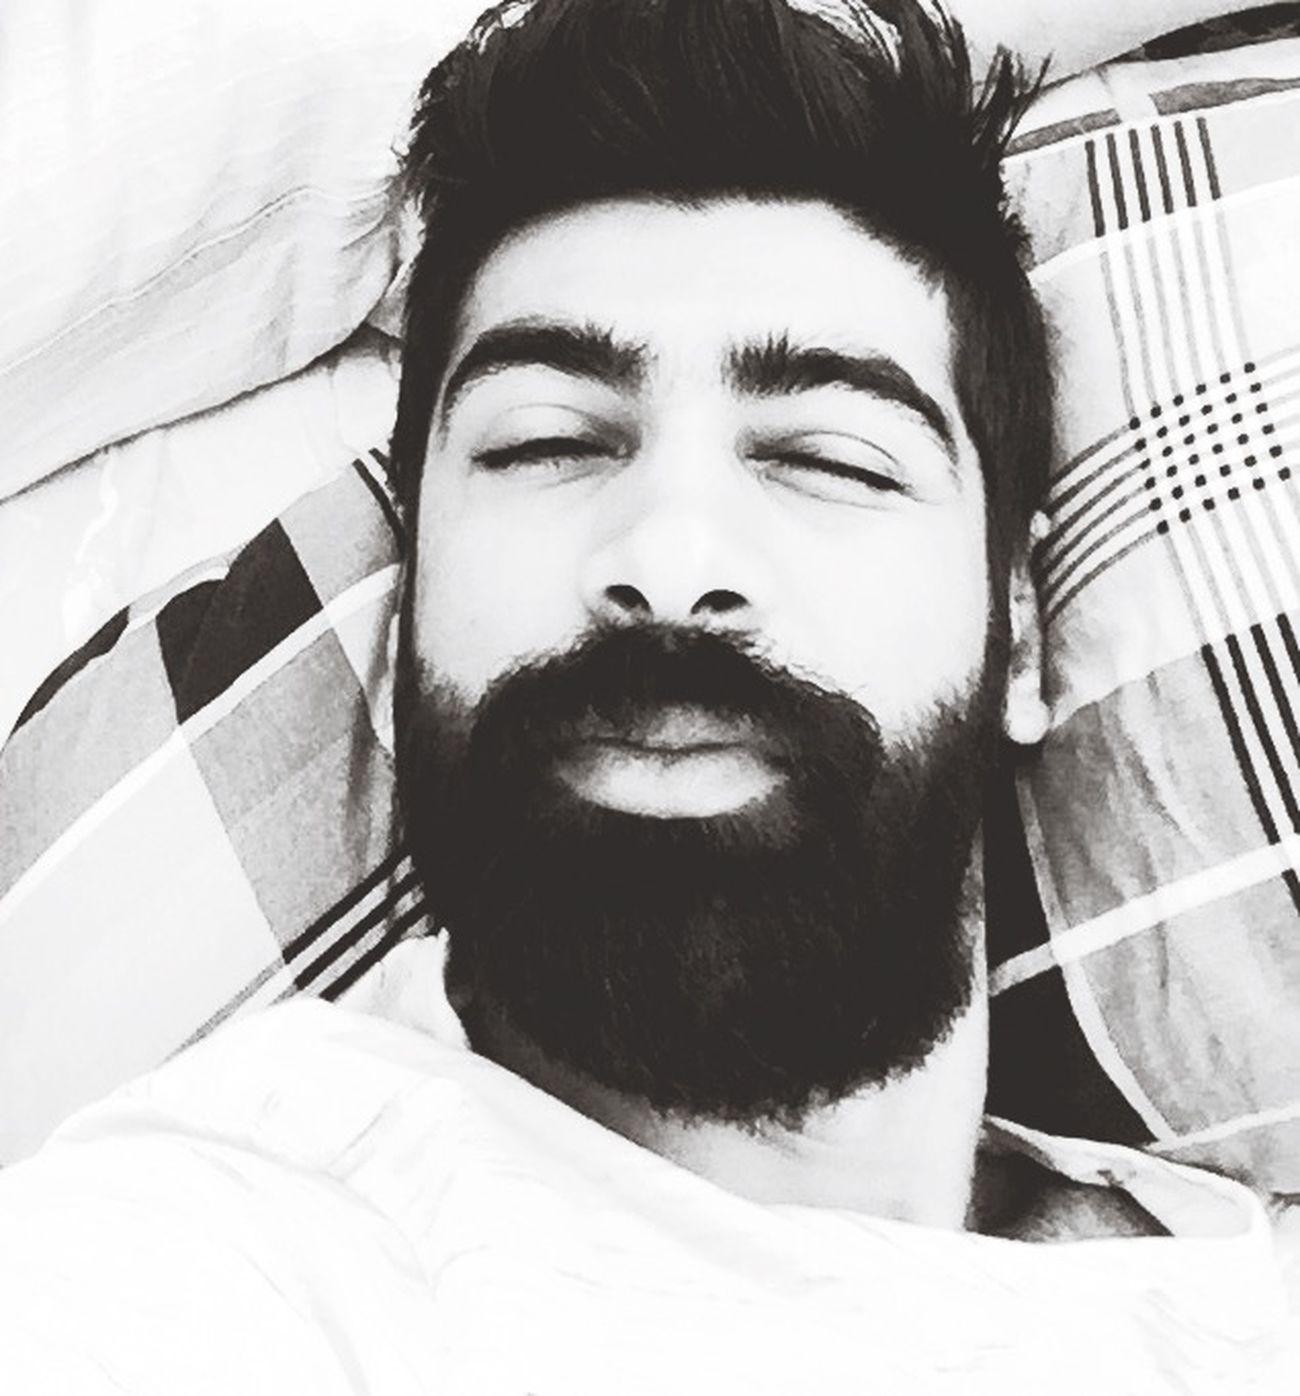 Selfie ✌ Blackandwhite Siyahbeyaz Merhaba Uykusuz Followme First Eyeem Photo Off Hi! Taking Photos